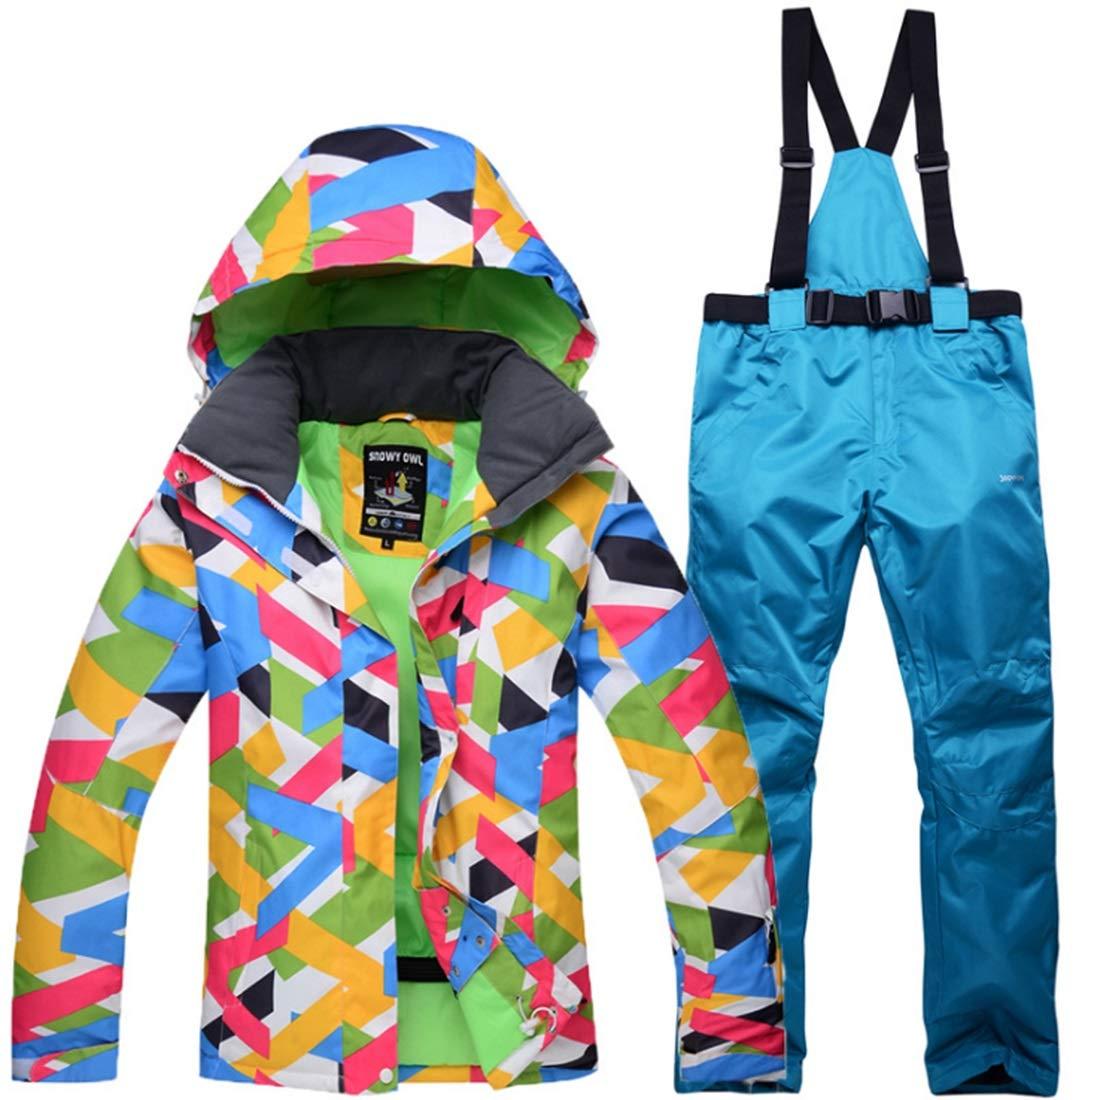 YXDIANZI 女性の防風スキー スーツ防水スキーパンツ(S-XL) (色 : 04, サイズ : L)  Large